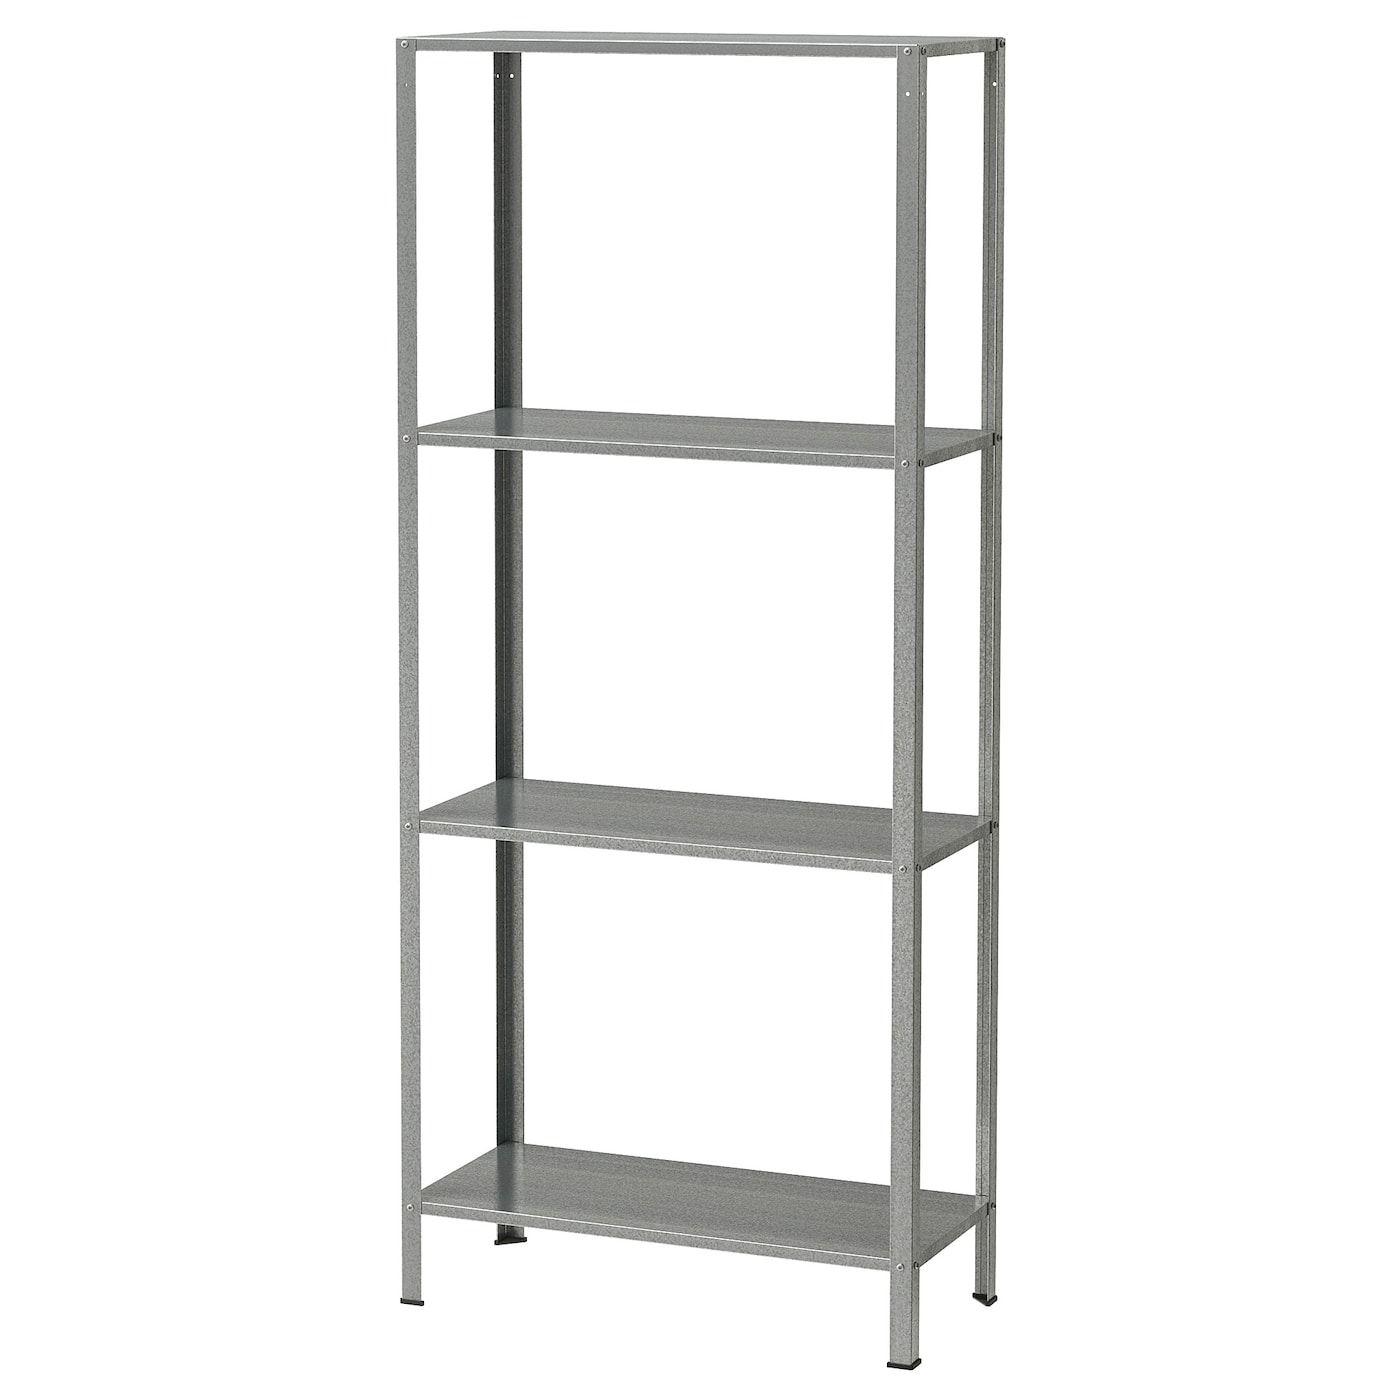 Hyllis Shelf Unit Indoor Outdoor Galvanized Ikea In 2020 Ikea Shelves Ikea Shelves